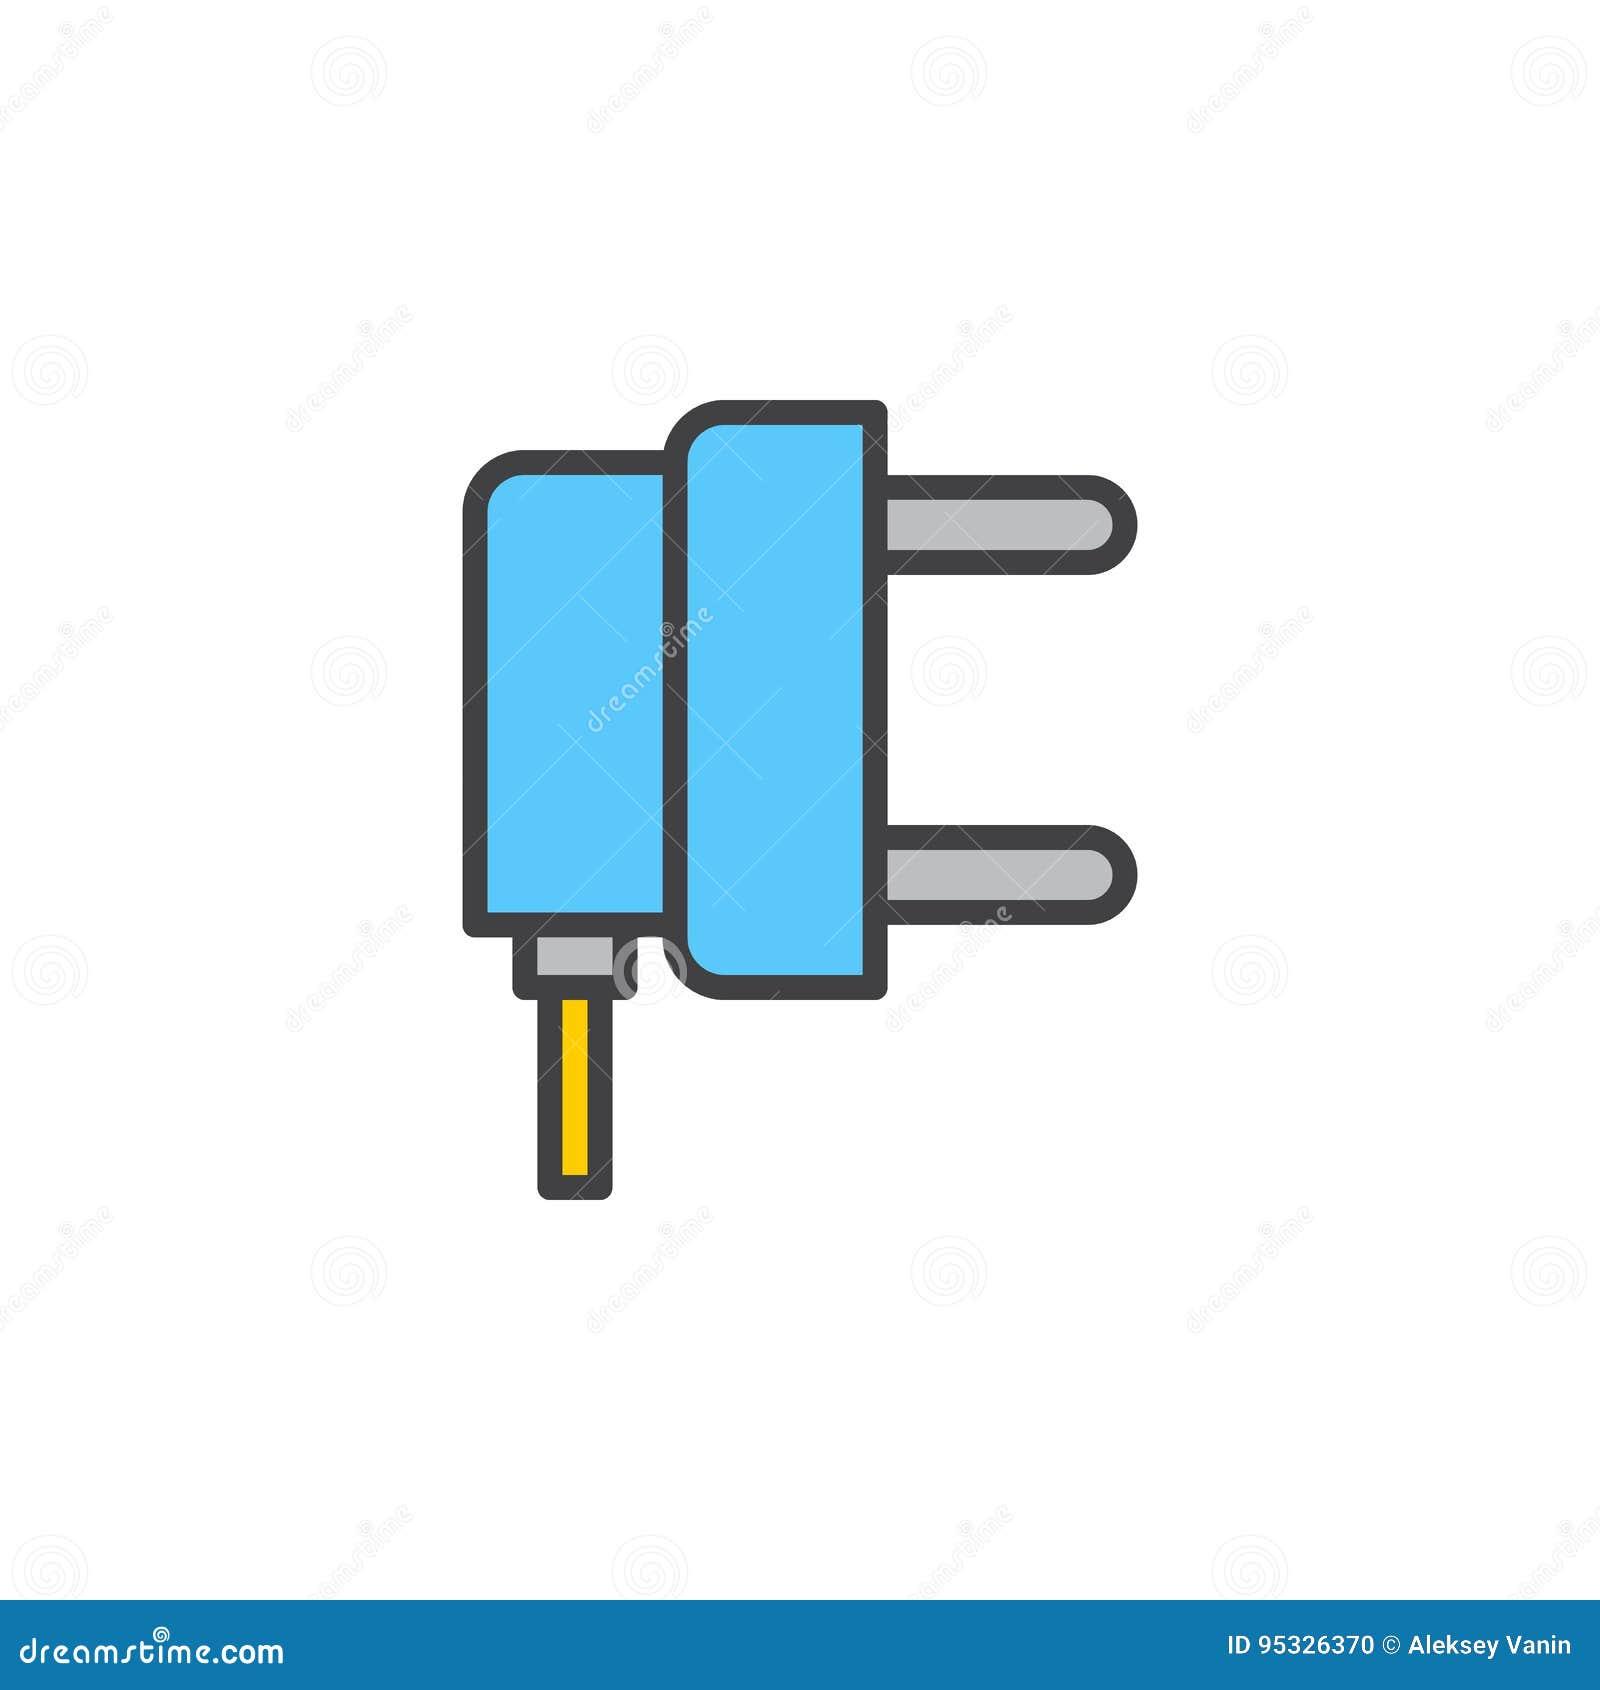 Fancy Ac Power Symbol Ensign - Electrical System Block Diagram ...